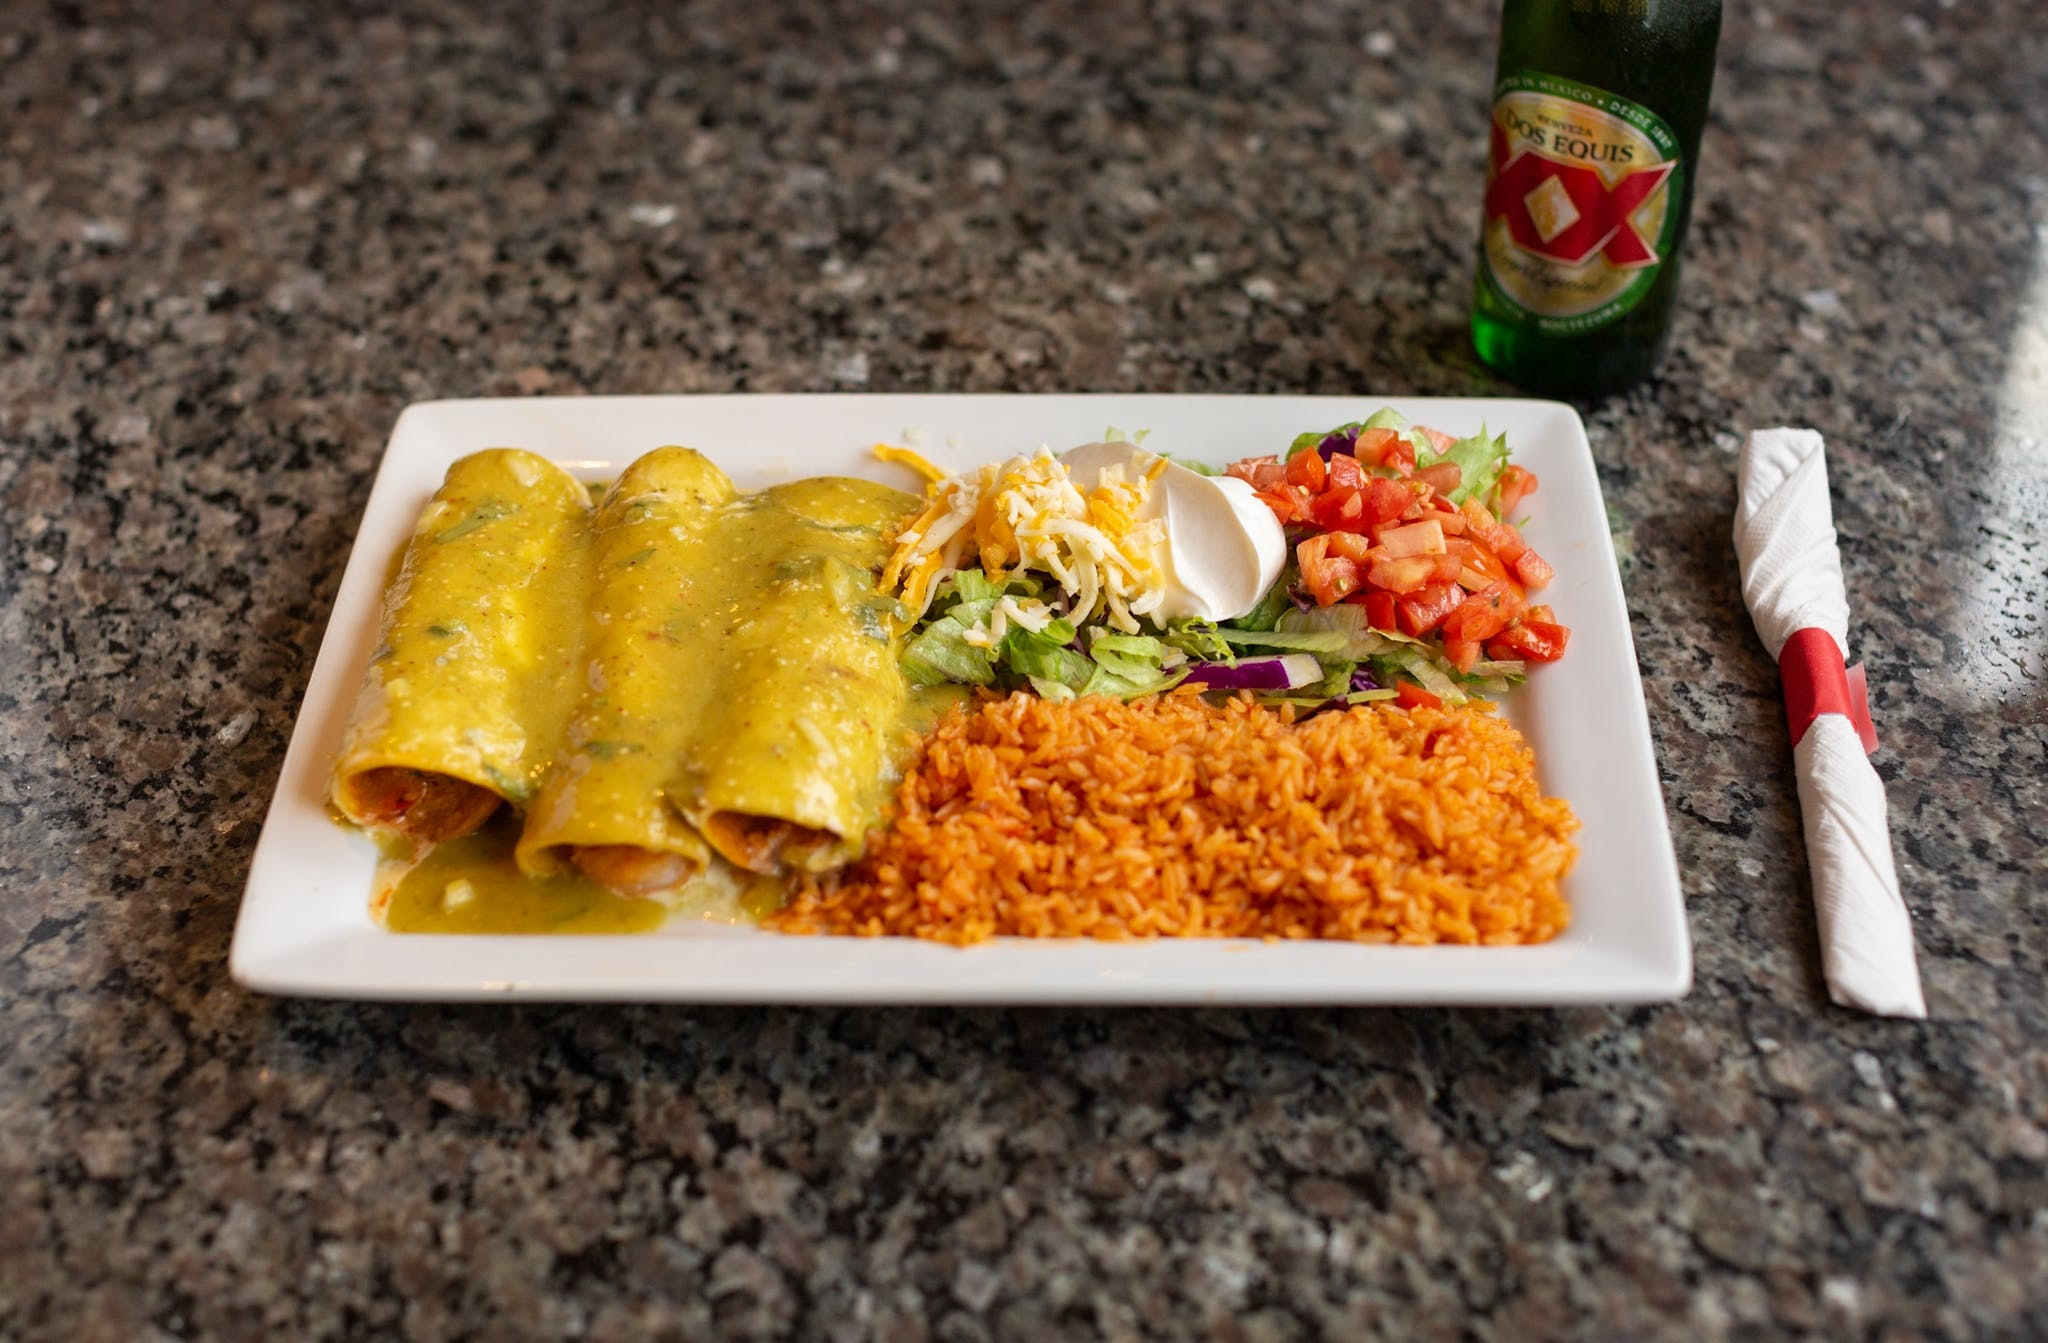 Enchiladas Lawrence from El Mezcal in Lawrence, KS